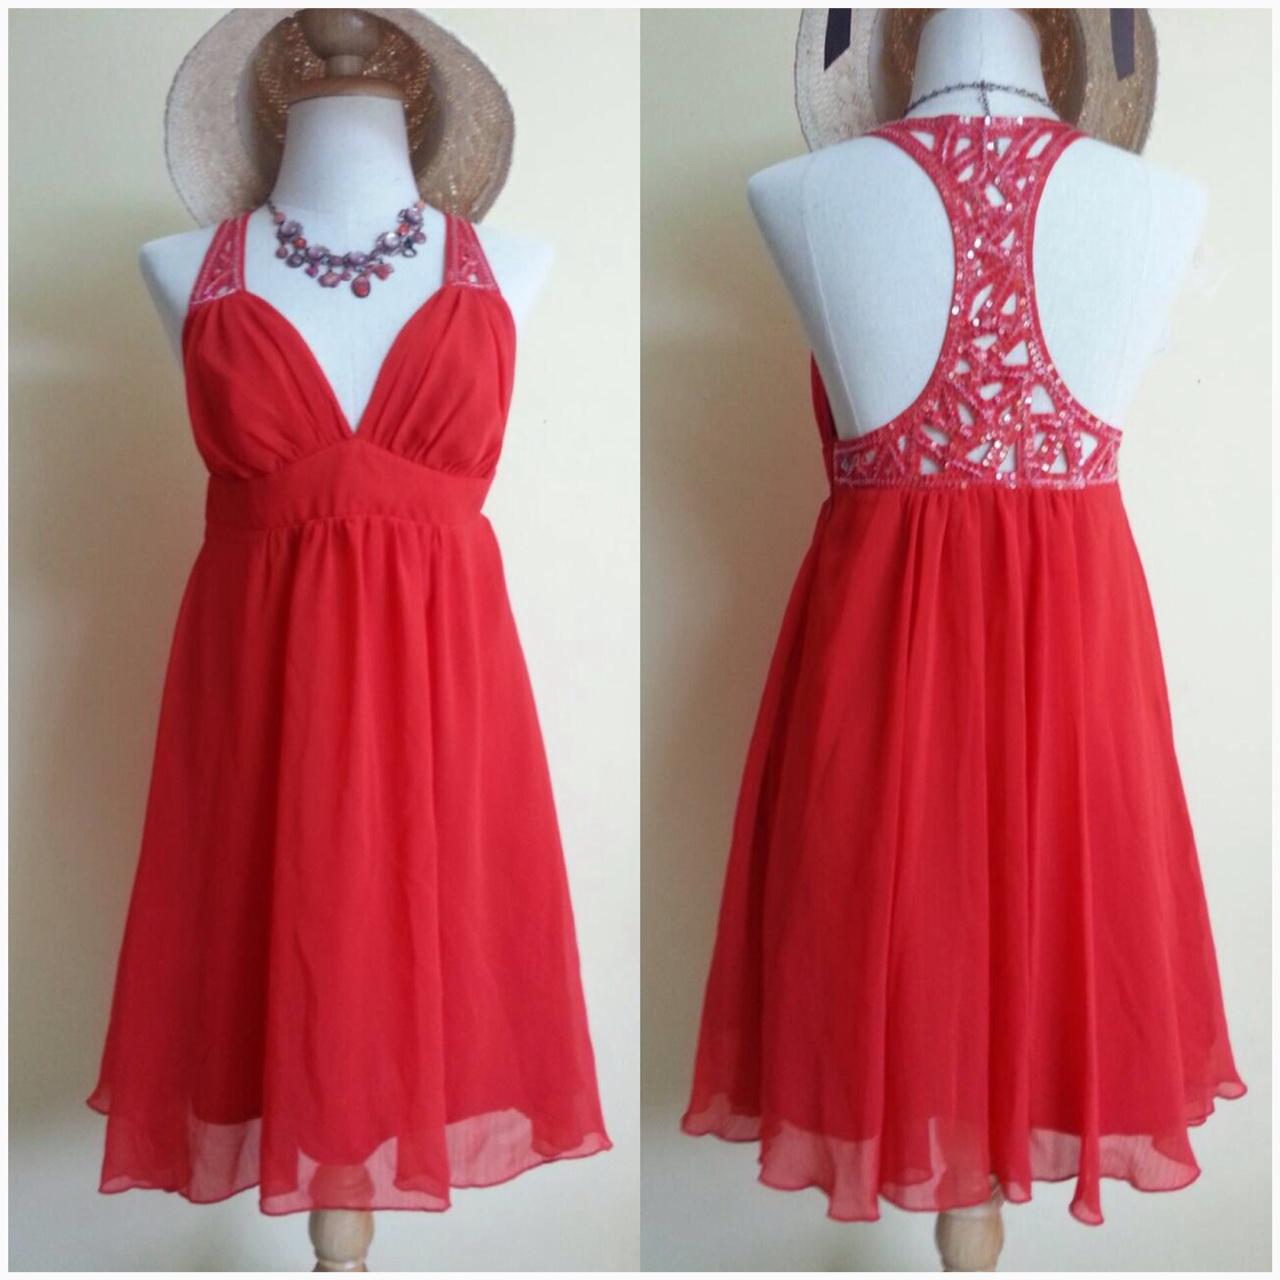 Lipsy Red Dress Uk10